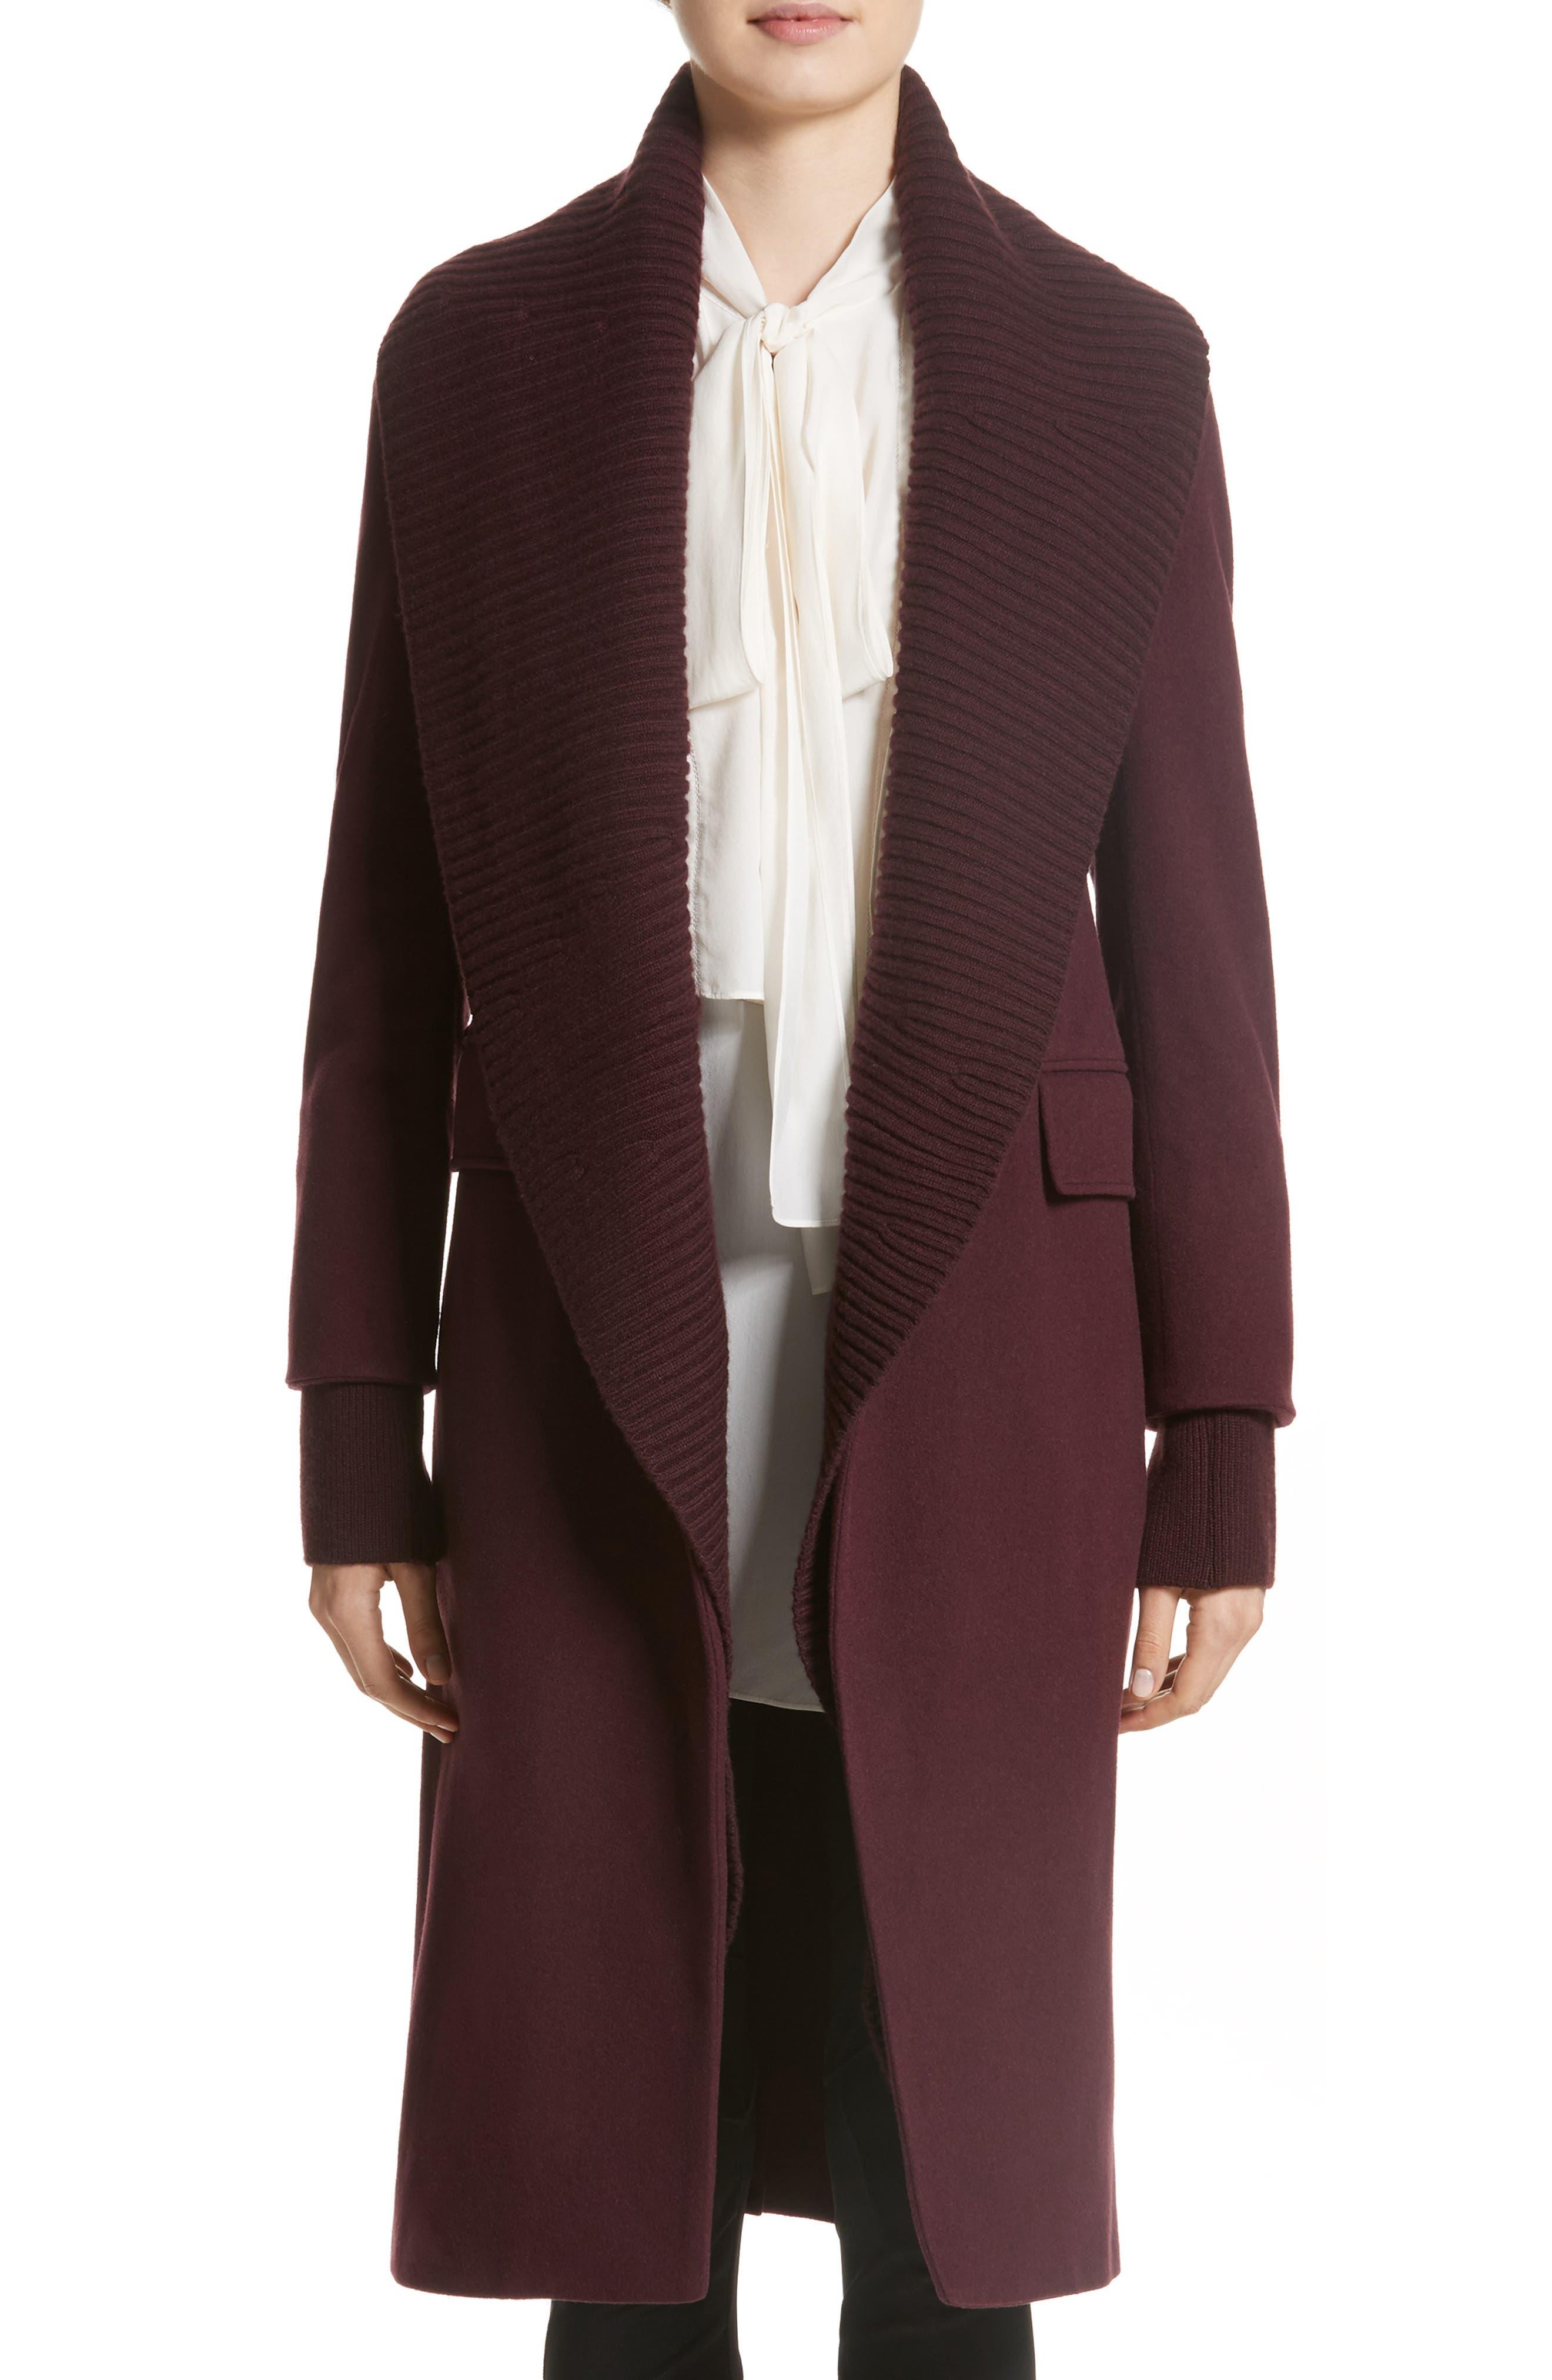 Burbery Cairndale Knit Trim Cashmere Coat